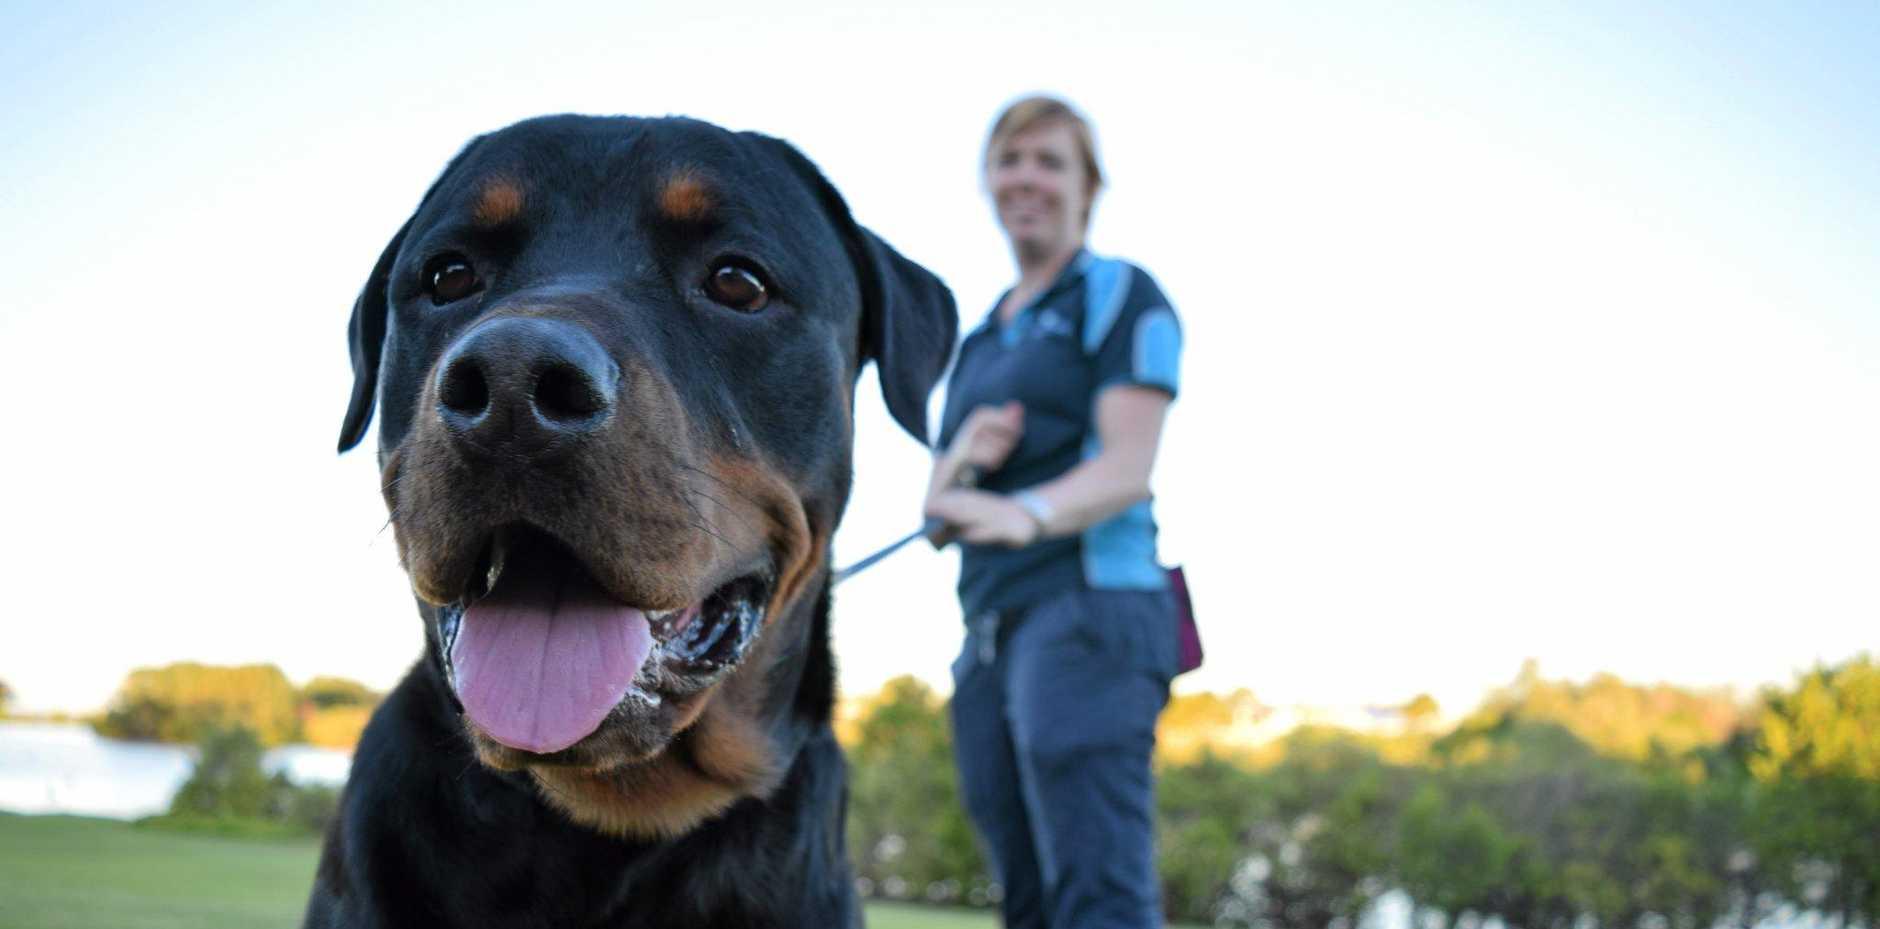 GOOD BOY: Dog trainer Tenille Williams says rottweilers like Diesel get a bad rap.